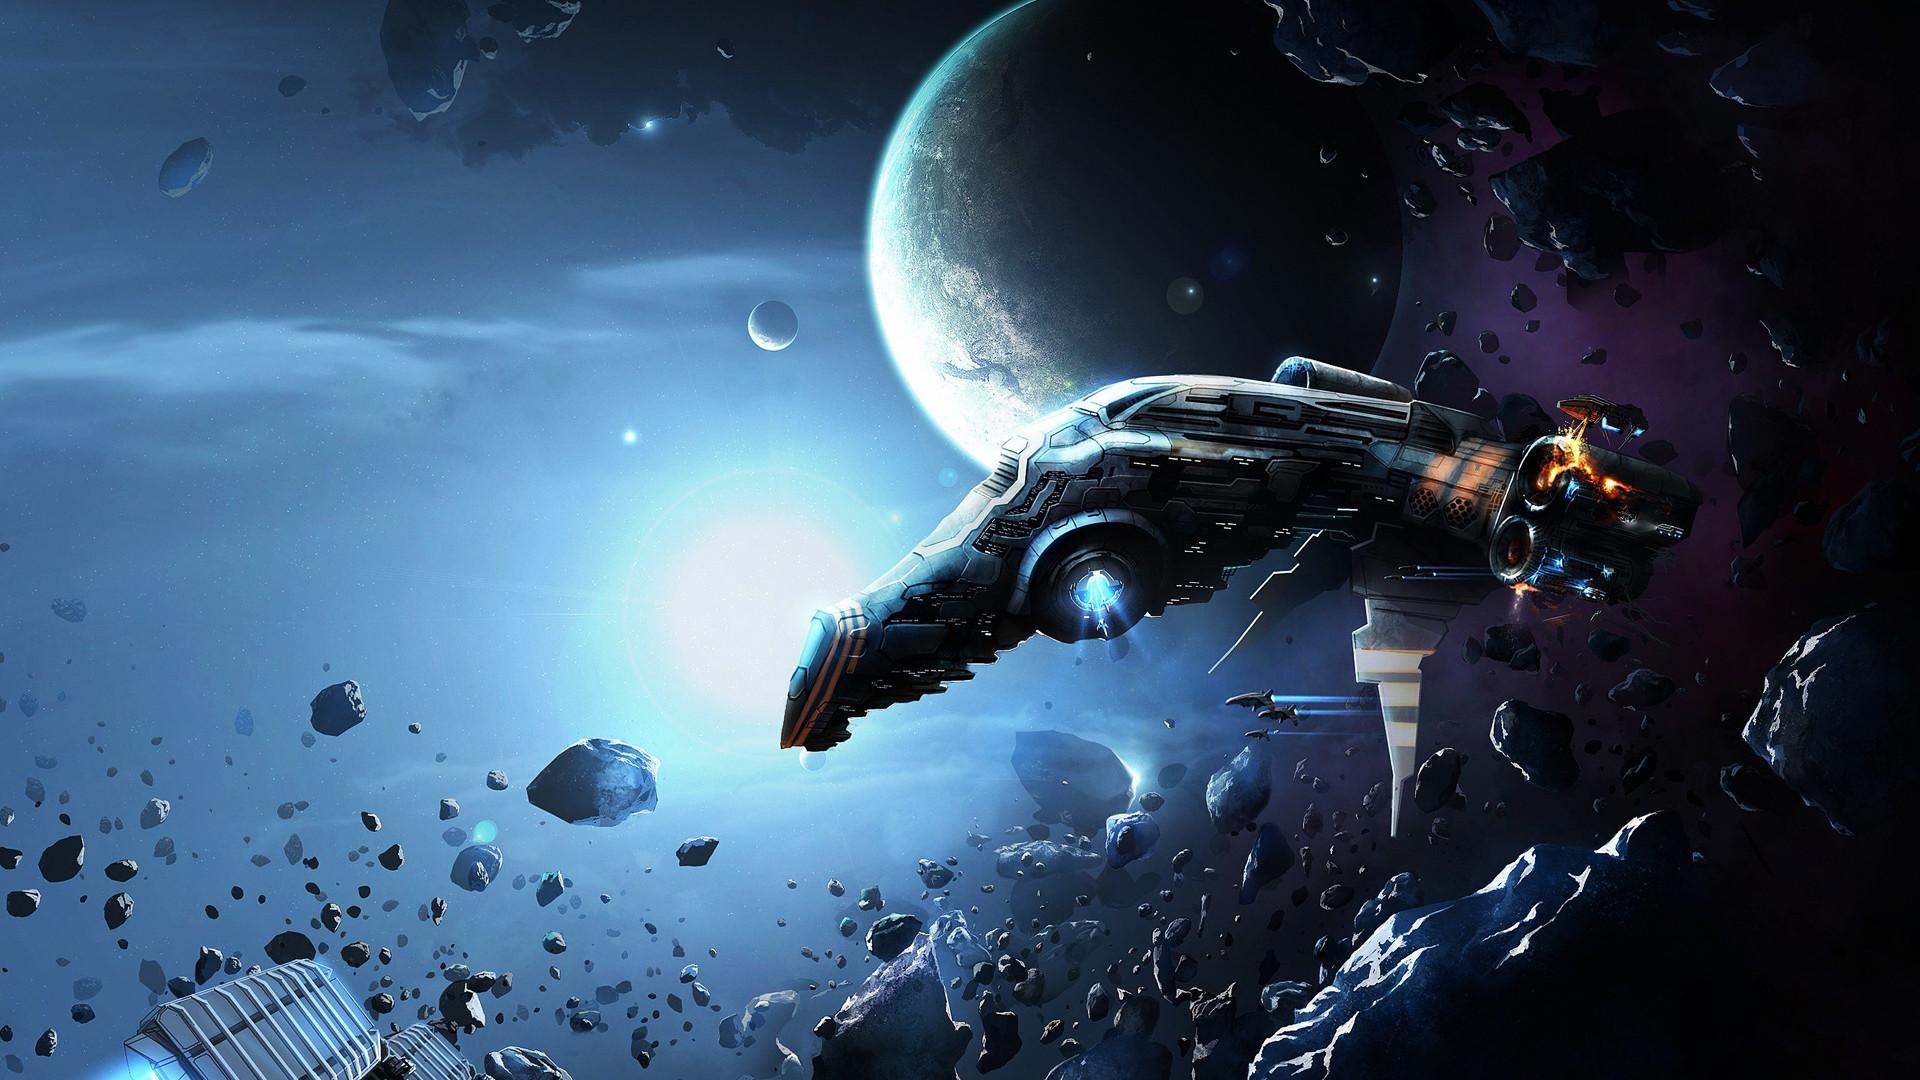 Eve Online Wallpaper wallpaper – 780603